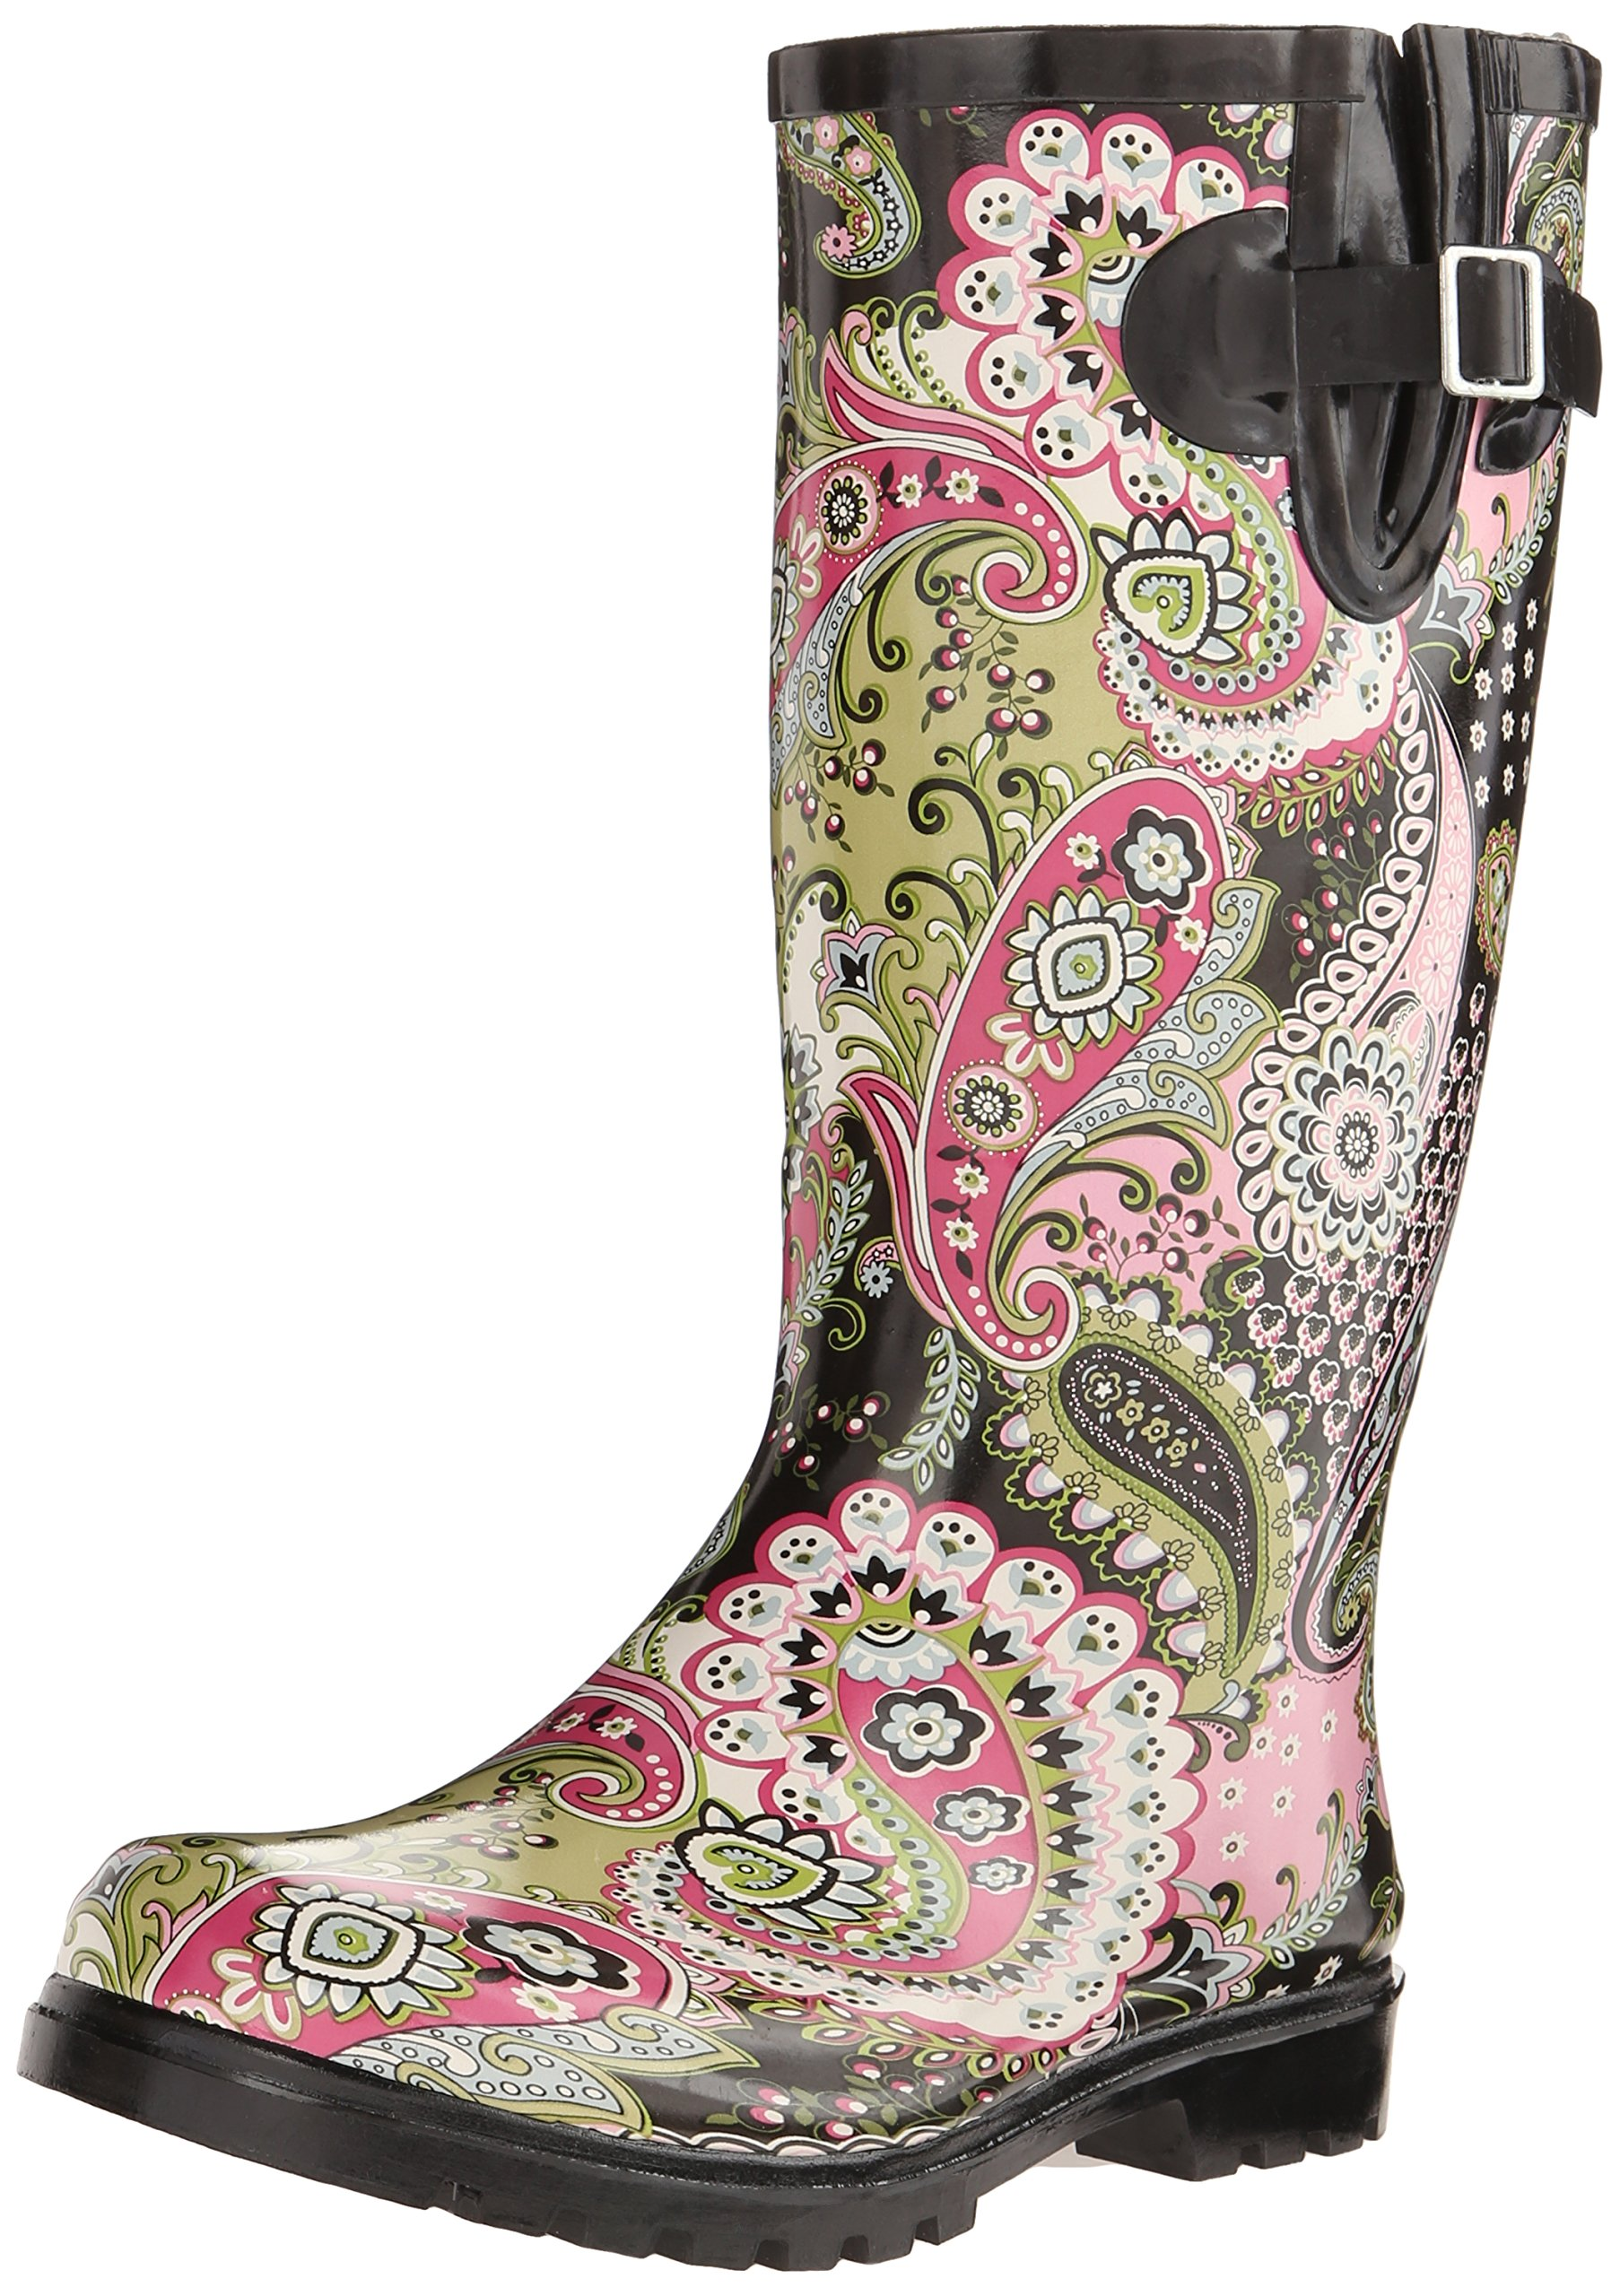 Nomad Women's Puddles Rain Shoe, Pink/Lime Paisley, 8 M US